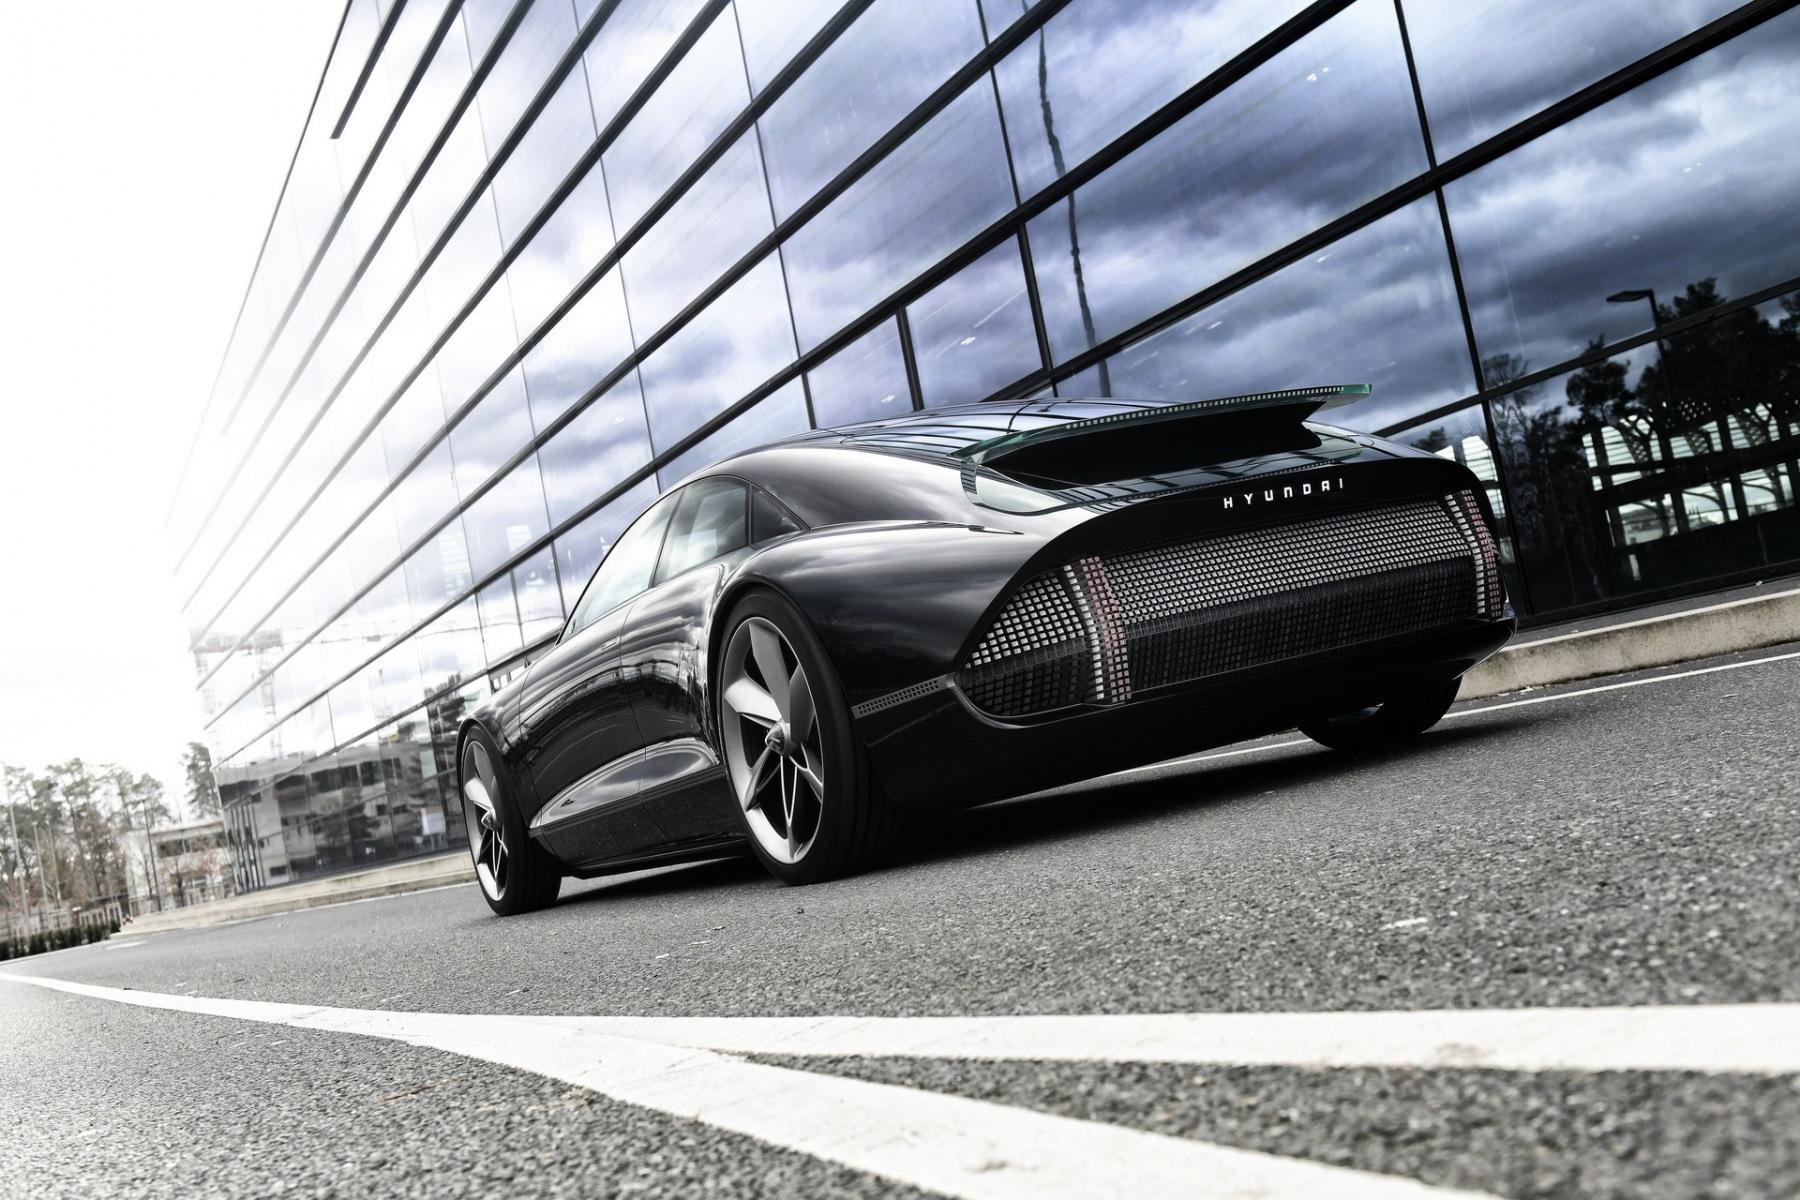 Hyundai Prophecy - 45 EV